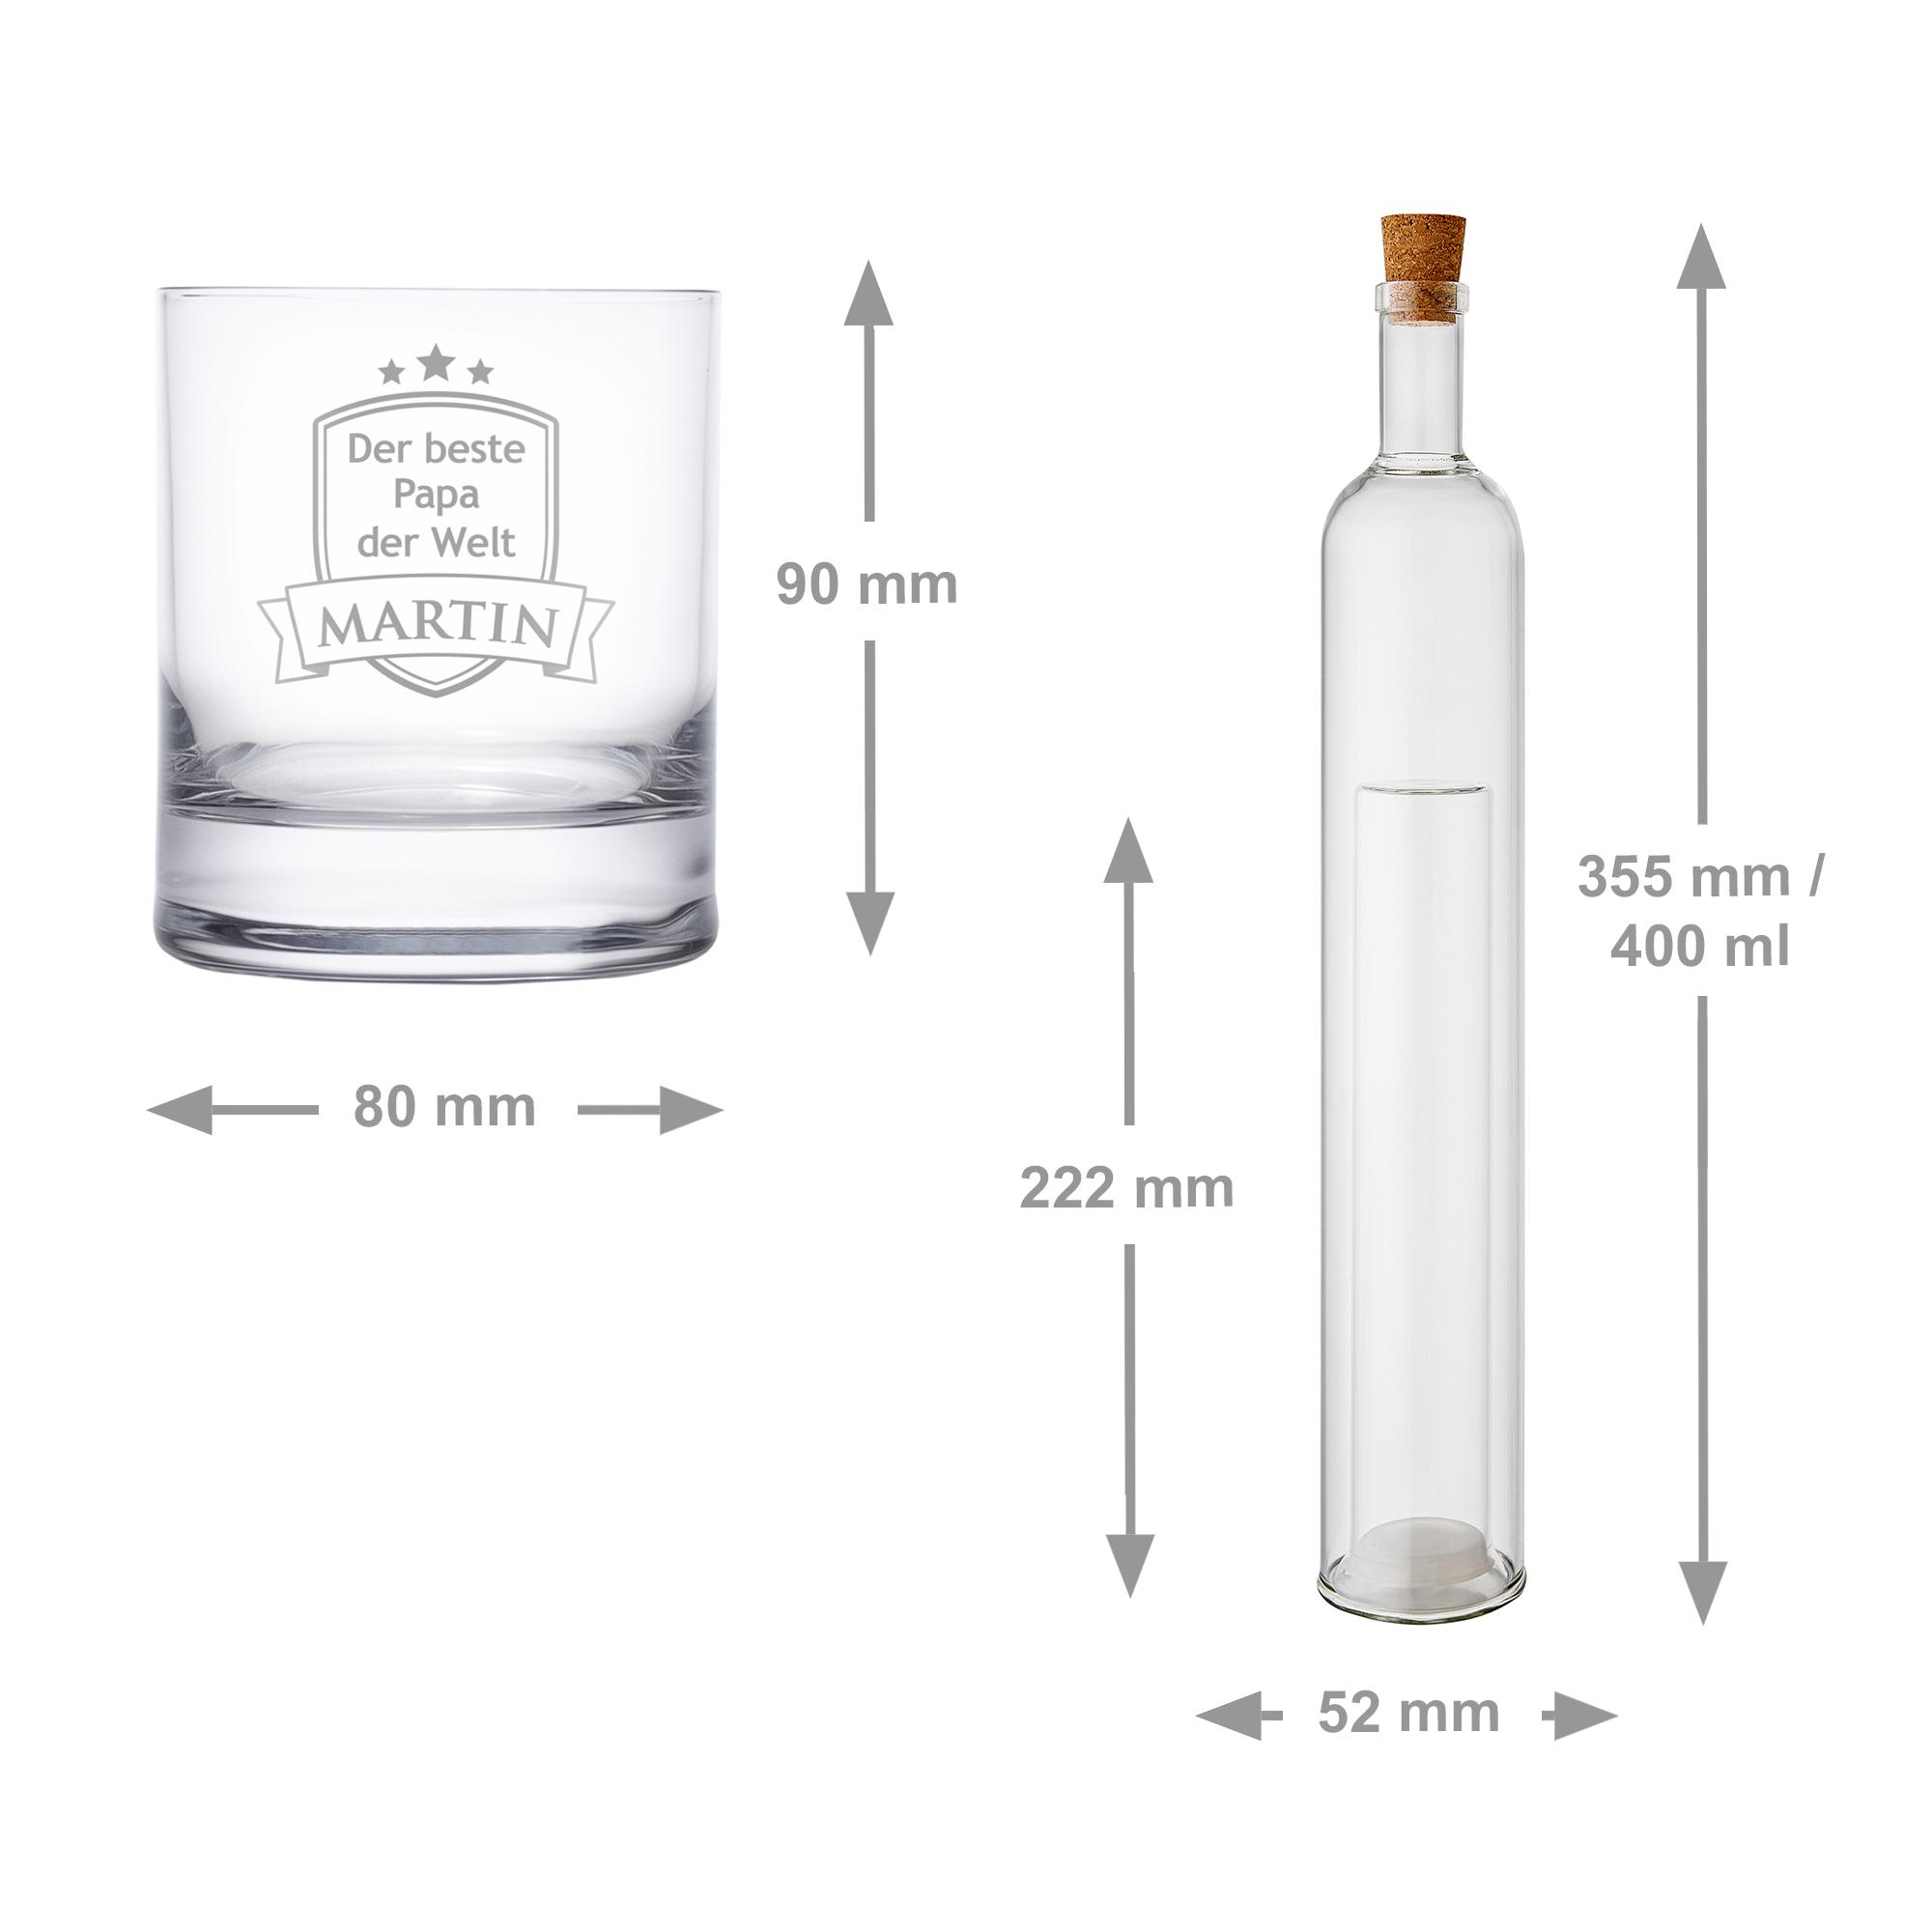 Bundle - Hohlraumflasche - Whiskyglas - Bester Papa - Personalisiert